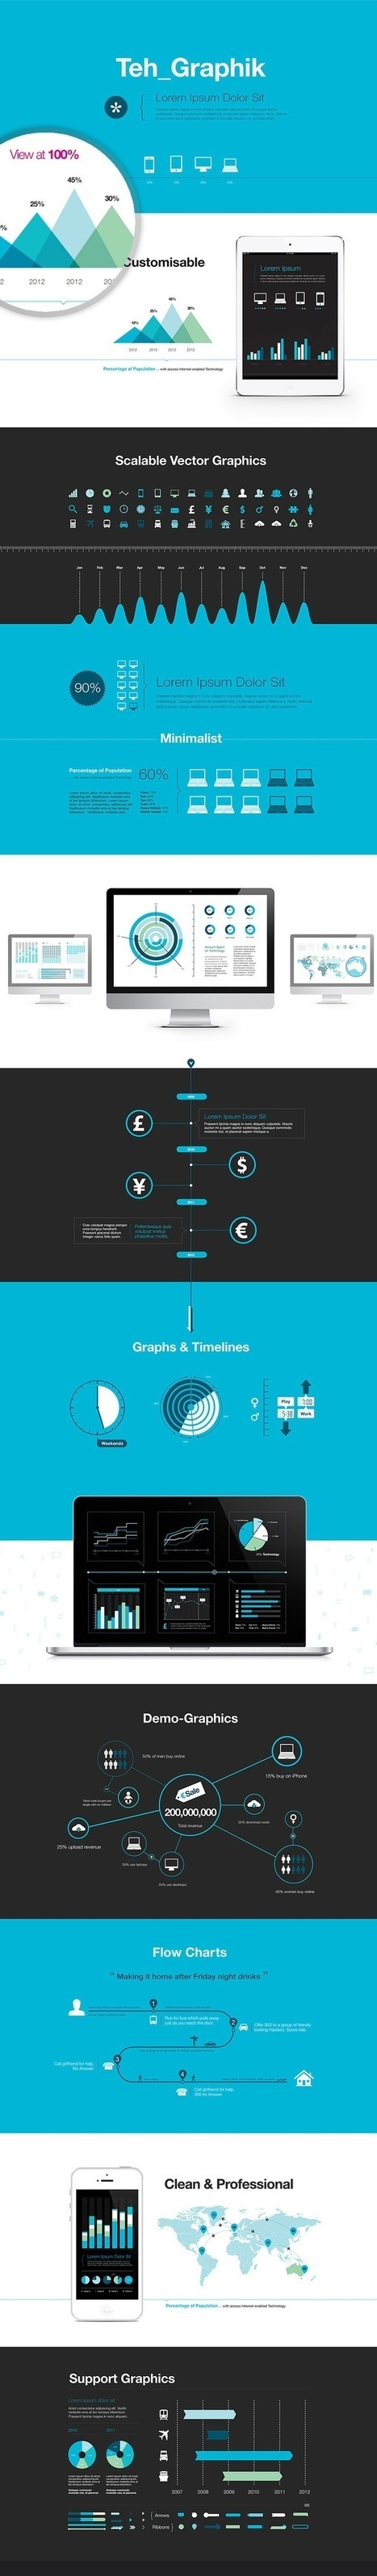 infographics | Web Design Ideas | Scoop.it